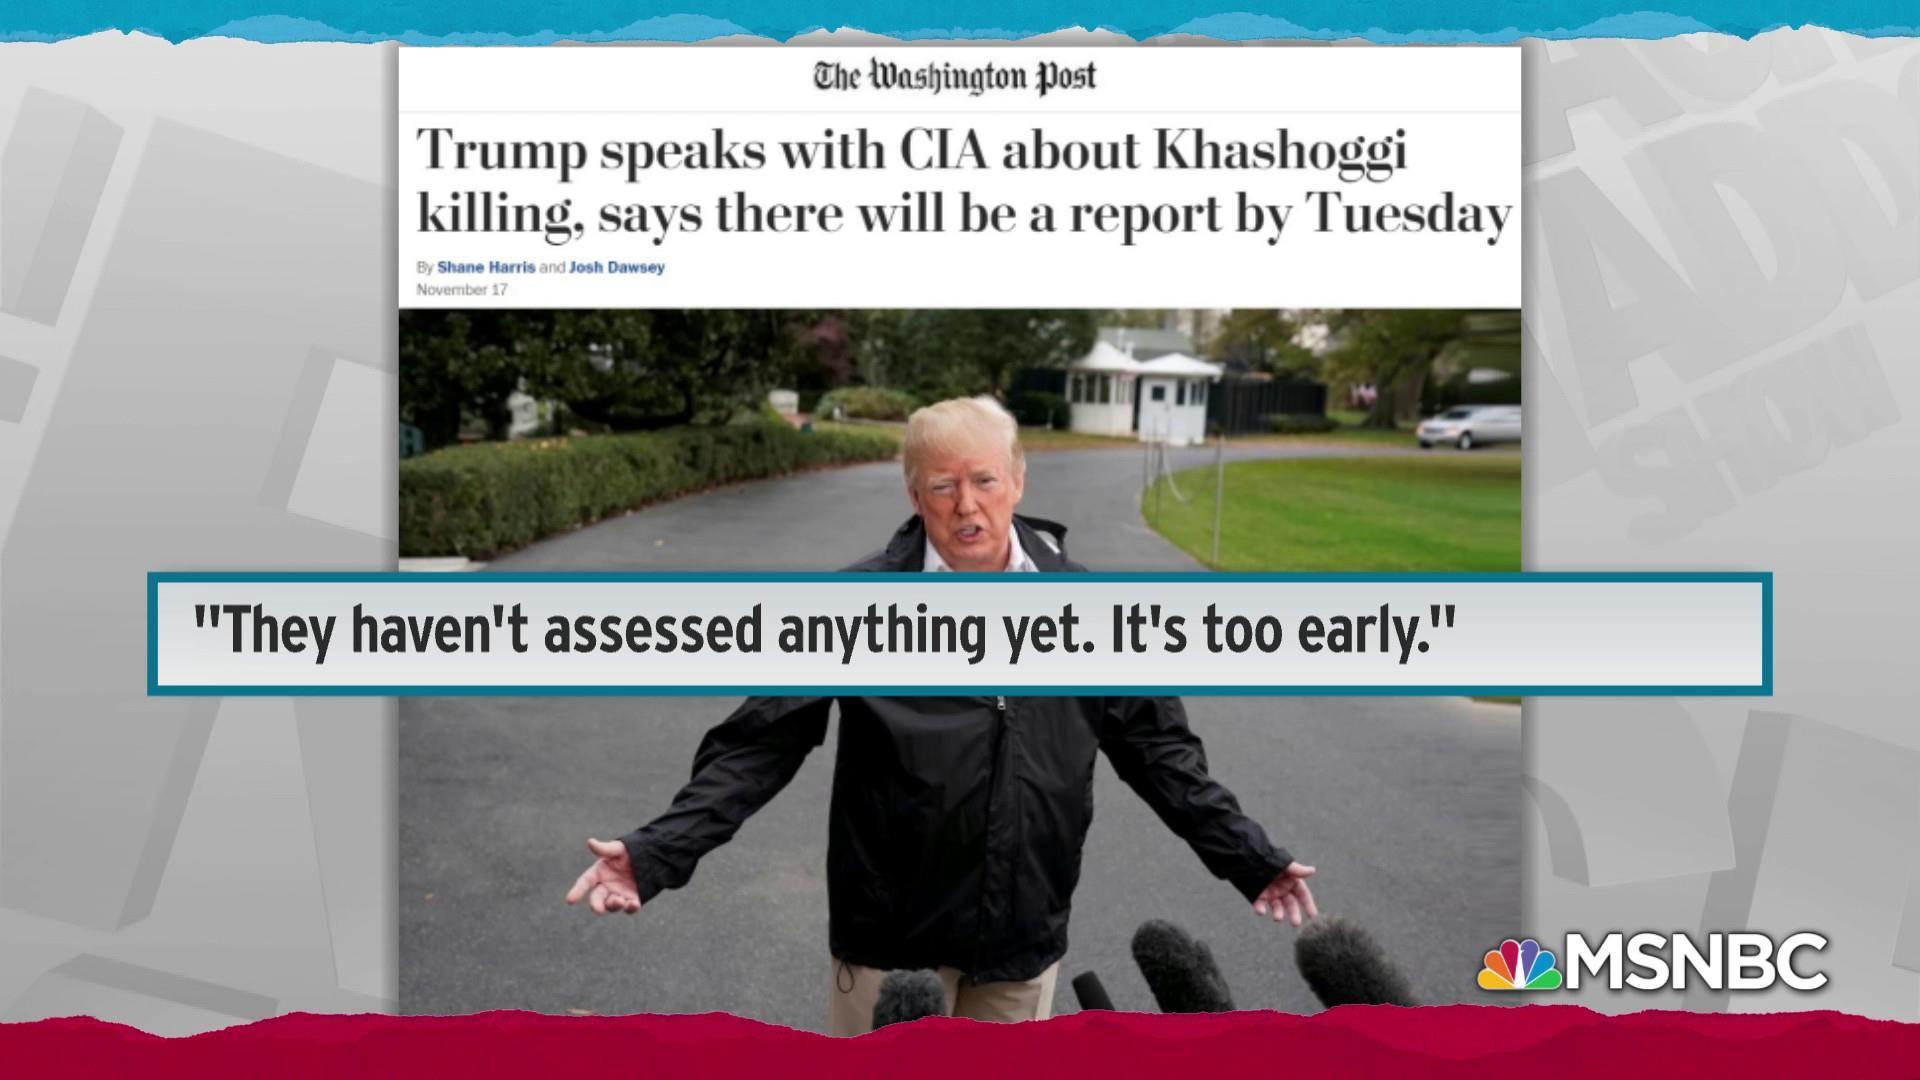 Trump weak on confronting Saudi Arabia over Khashoggi killing